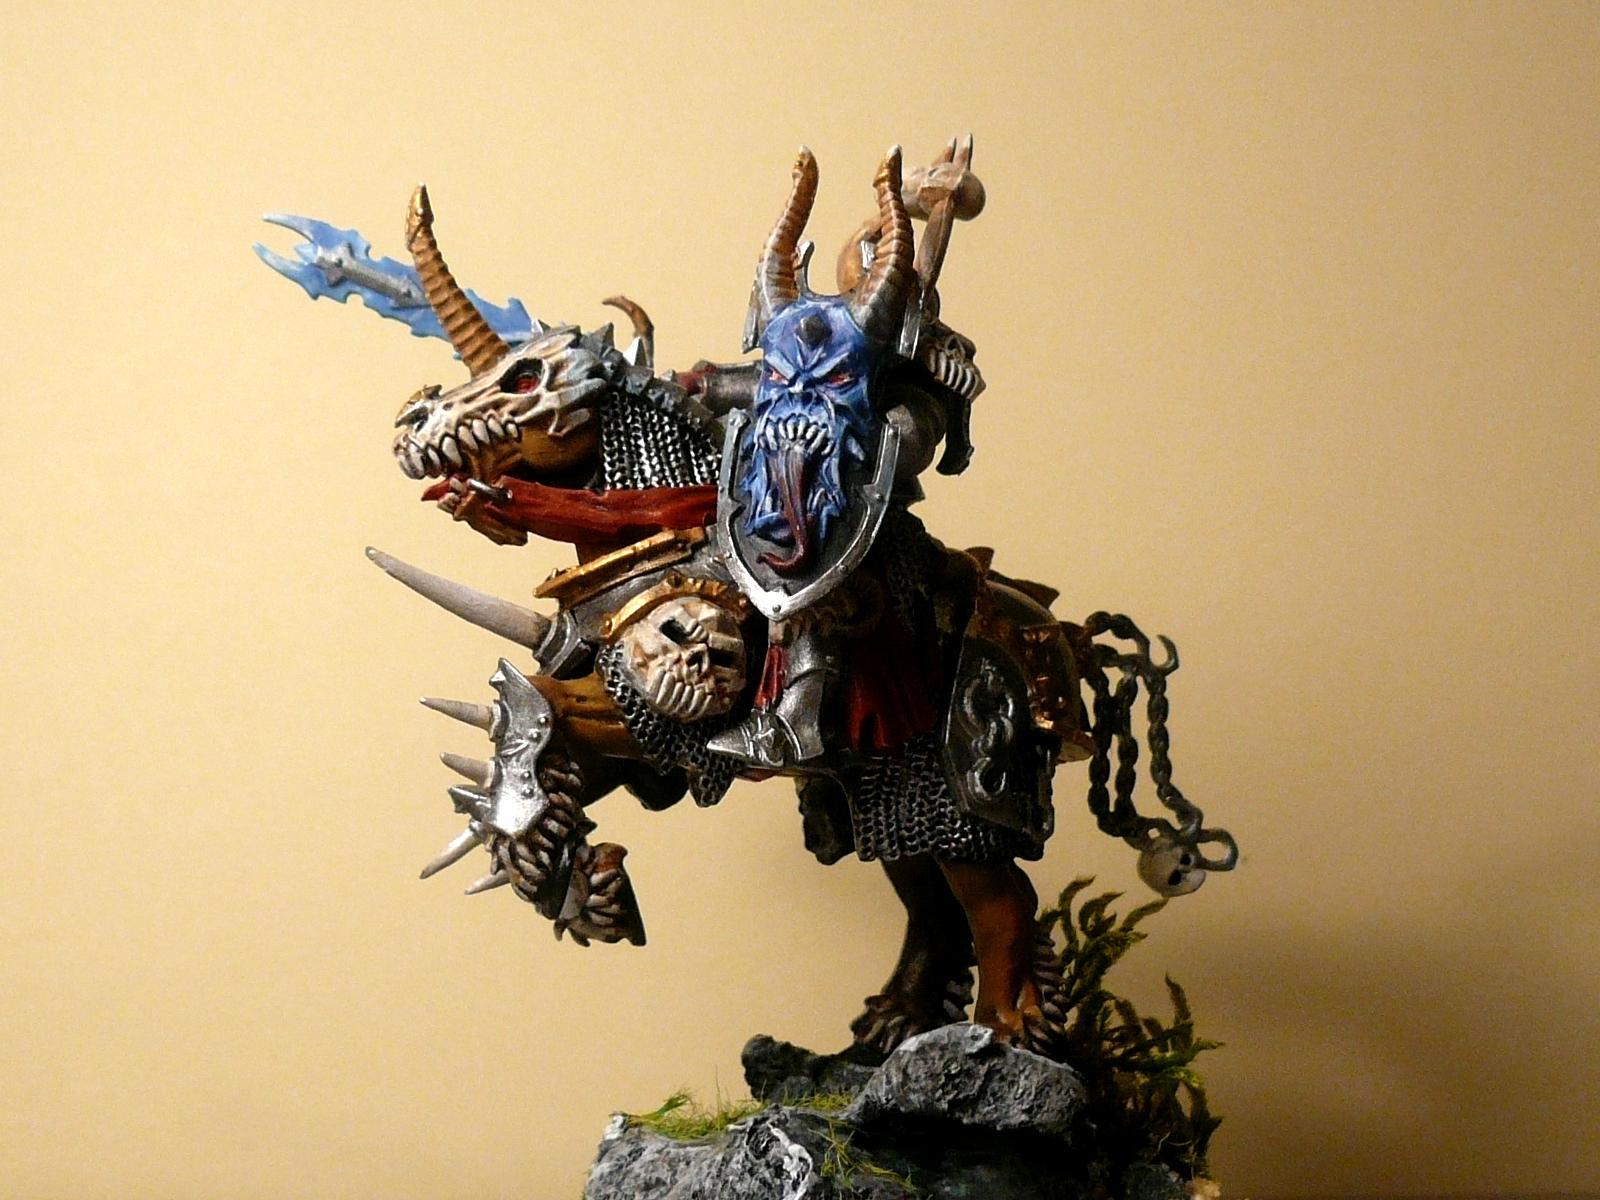 Chaos, Dark Knight, Horse, Mounted, Warhammer Fantasy